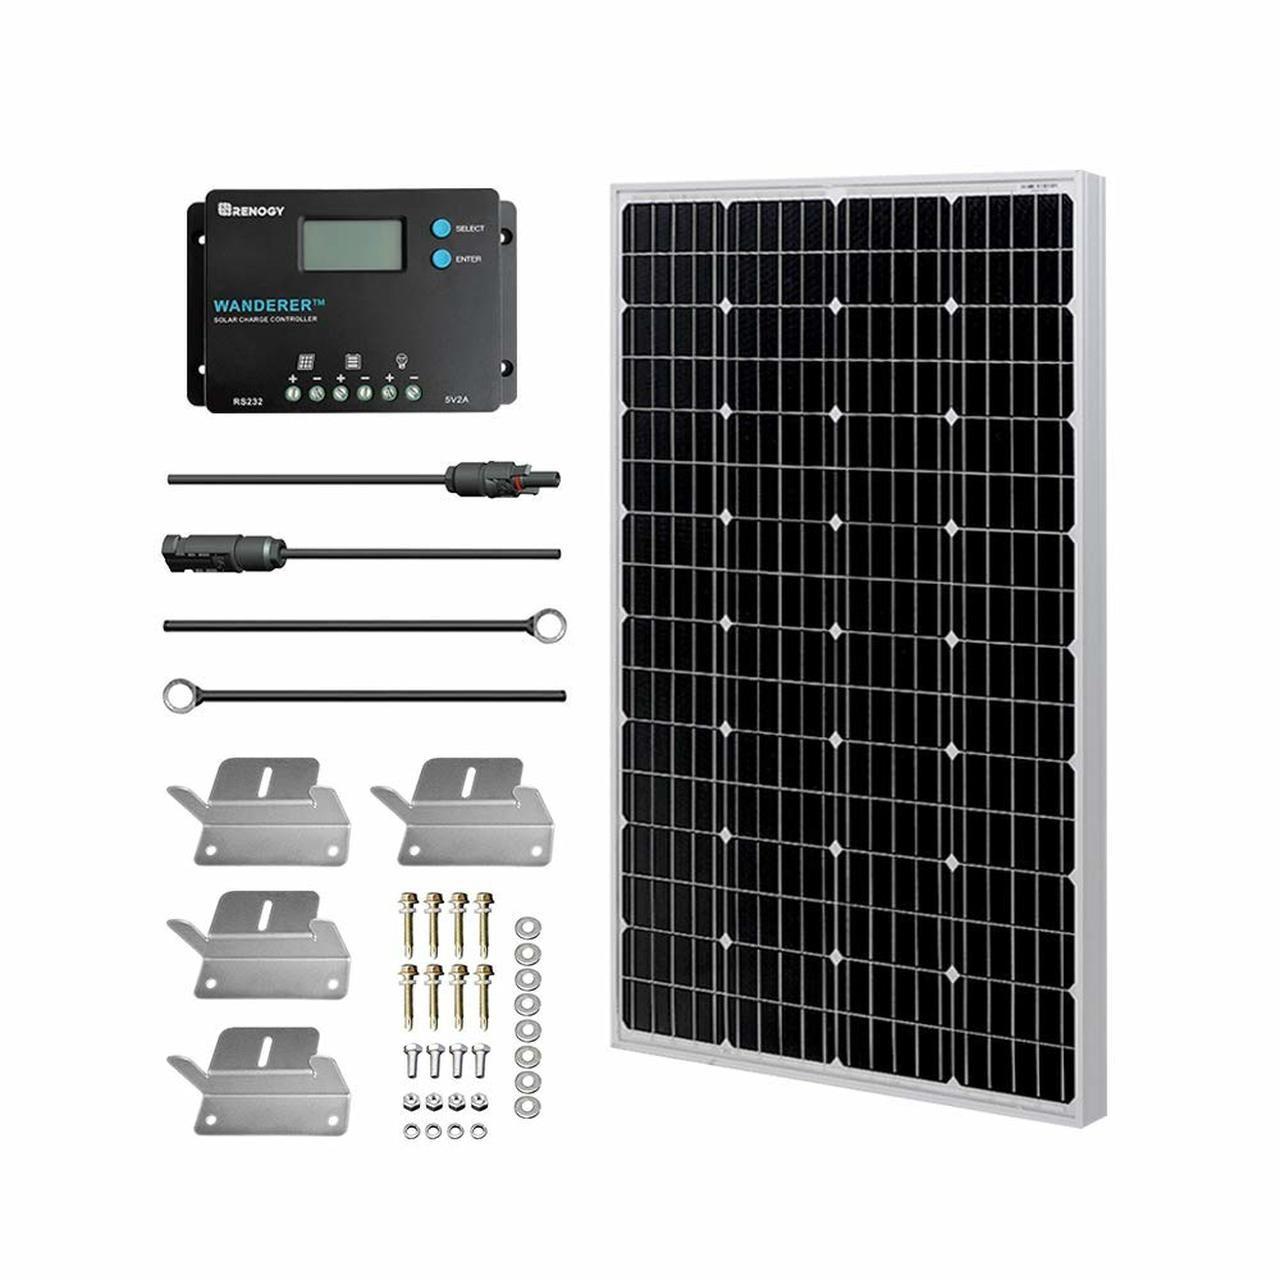 100w Monocrystalline Solar Panel Kit W 10a Pwm Controller In 2020 Solar Heating Monocrystalline Solar Panels Solar Energy Panels